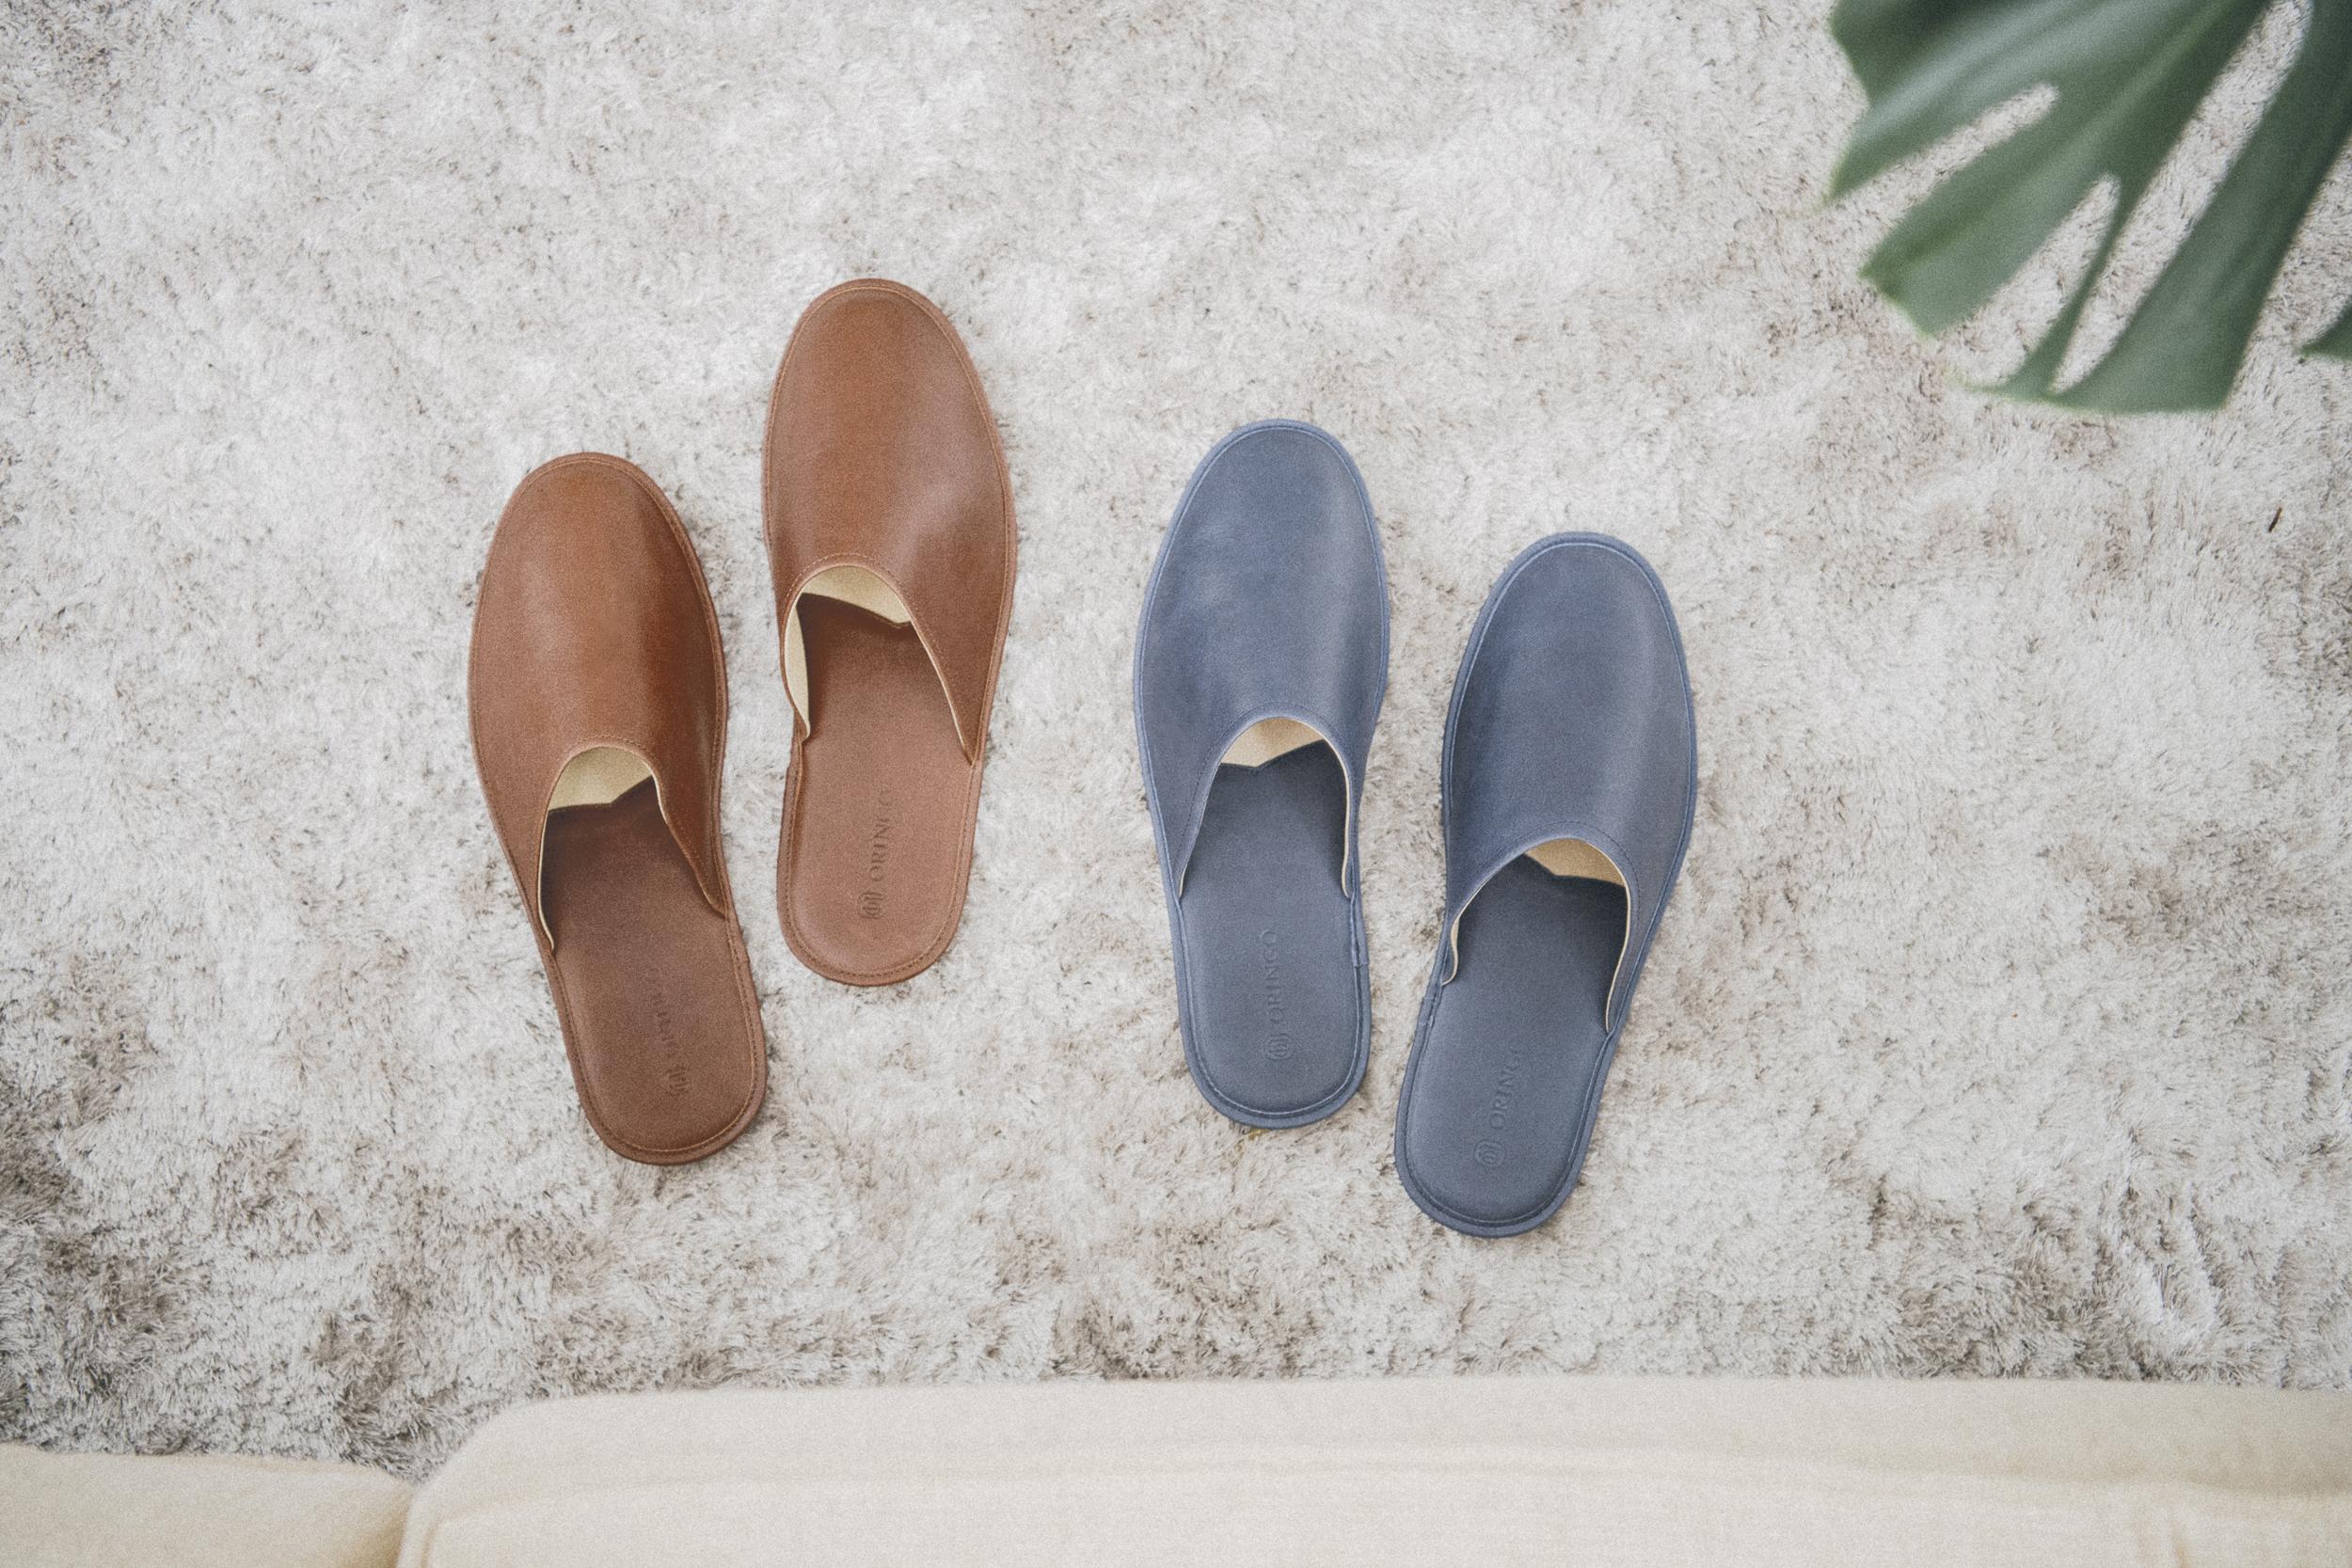 蠟感牛皮室內拖鞋 / ORINGO leather slippers